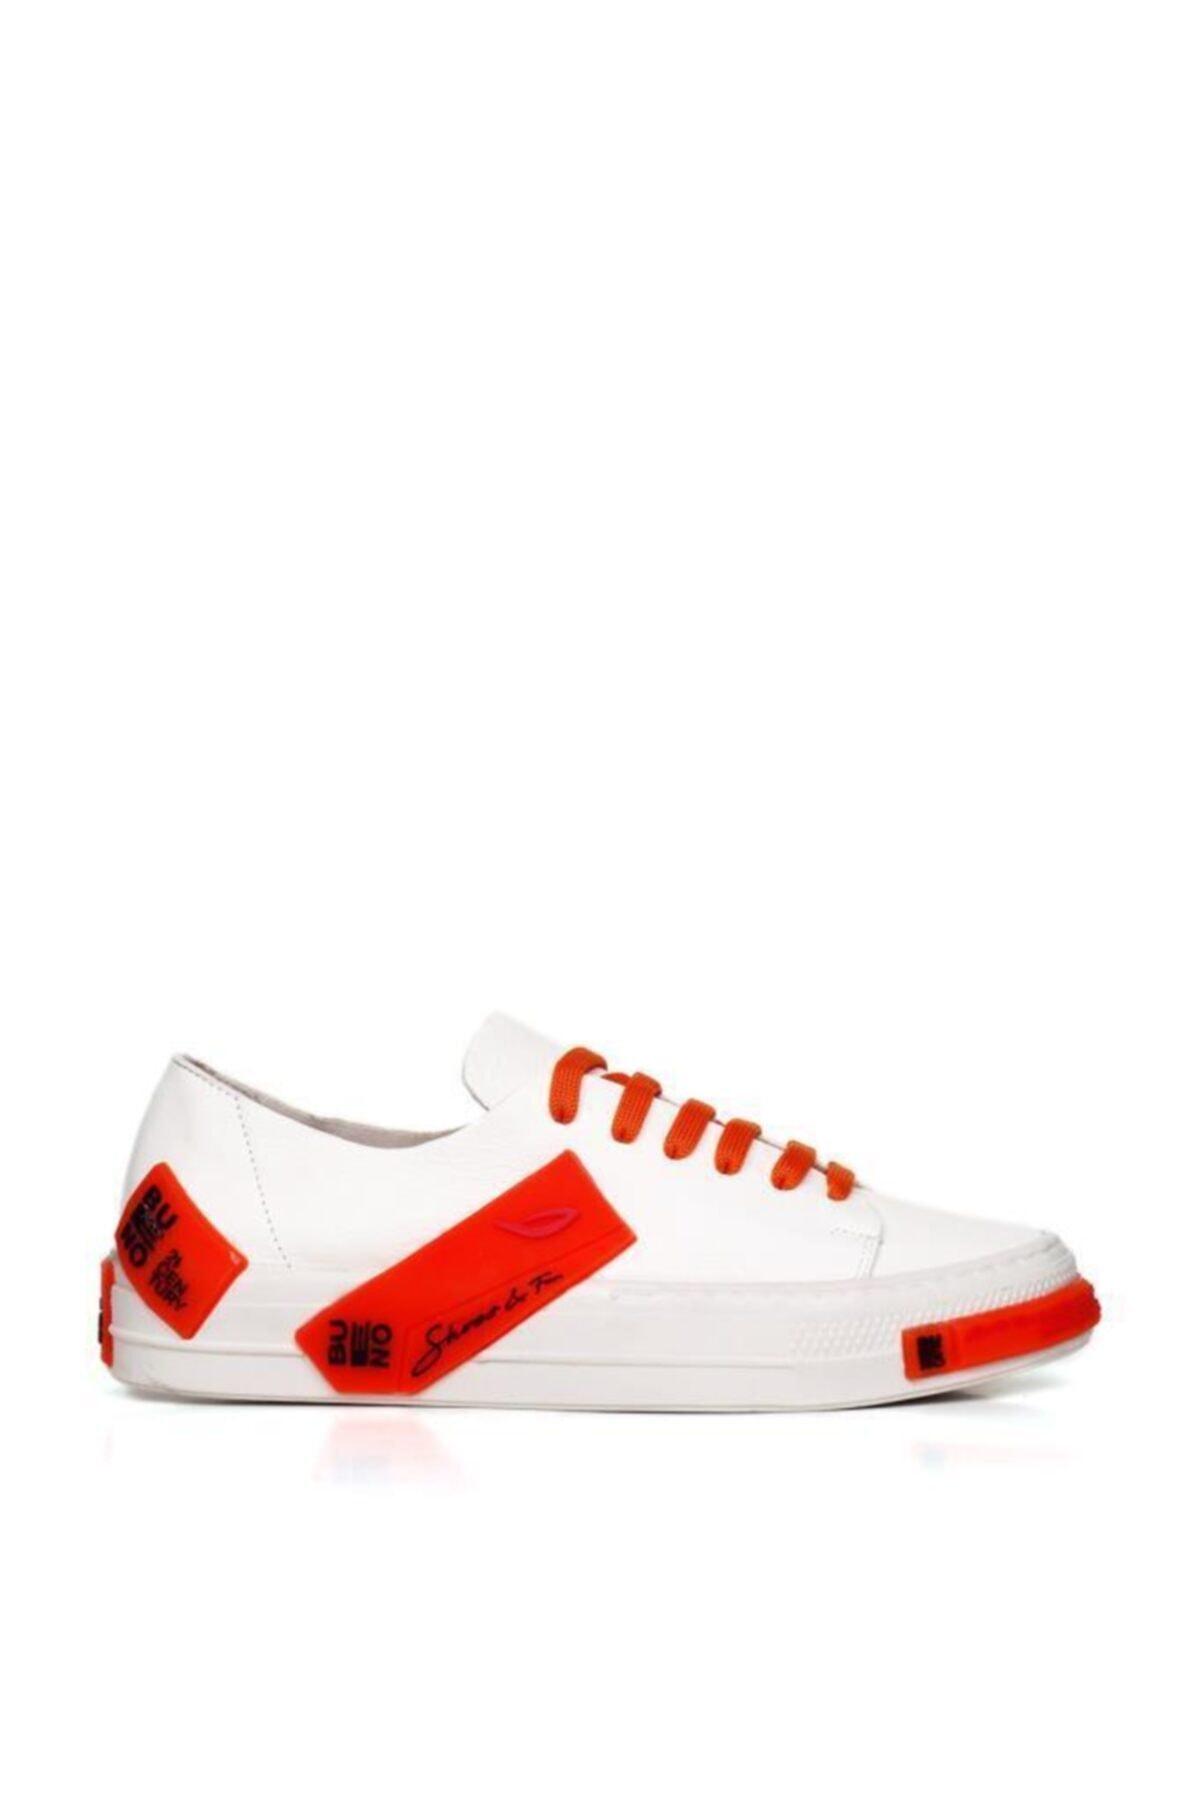 BUENO Shoes Kadın Spor 20wq10900 2